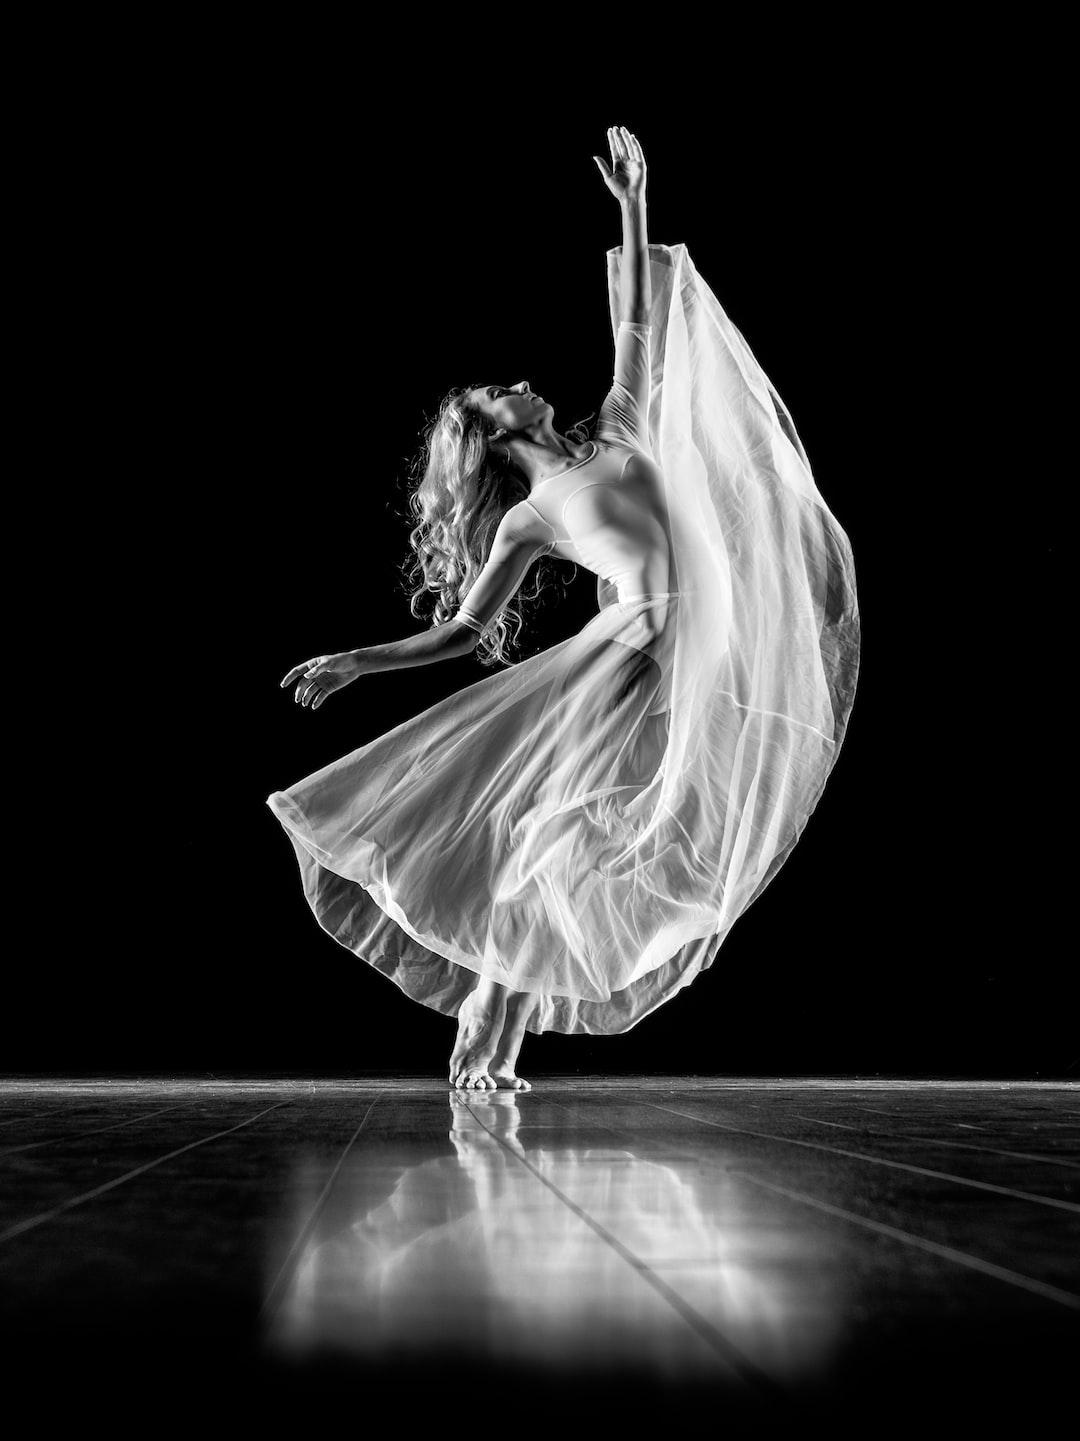 500 Dancer Pictures Hd Download Free Images On Unsplash